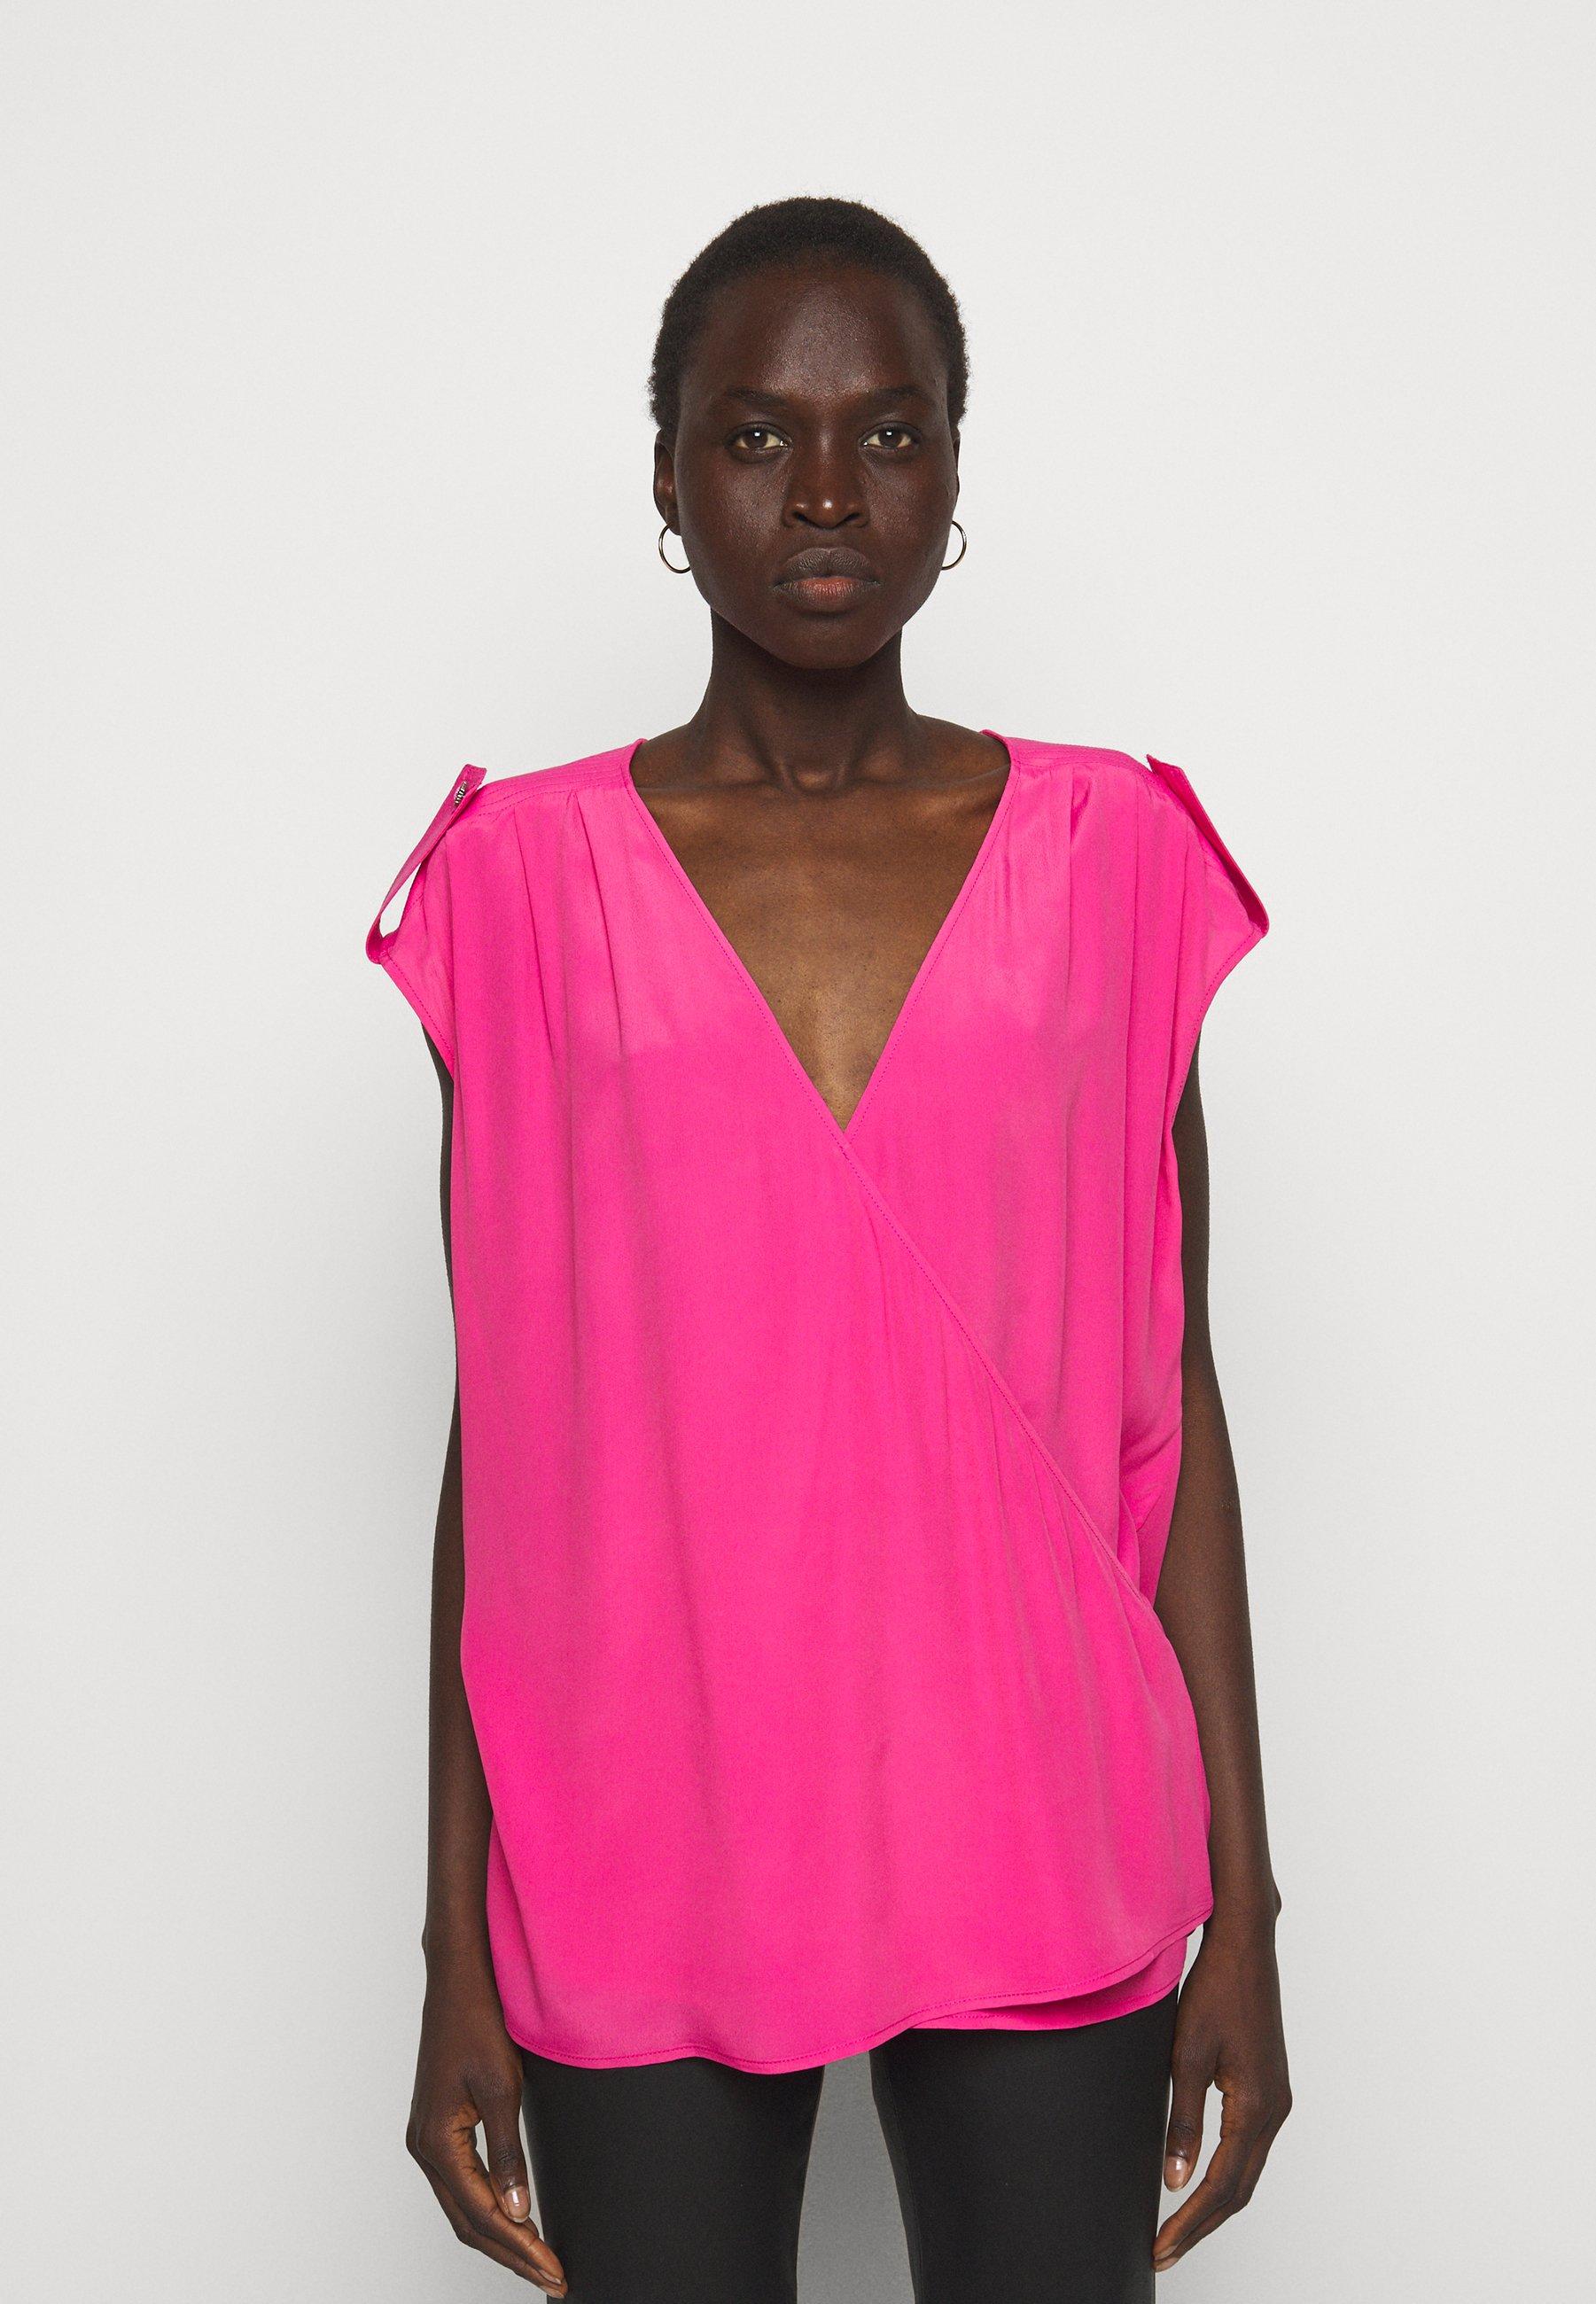 Donna INCROCIATO - T-shirt con stampa